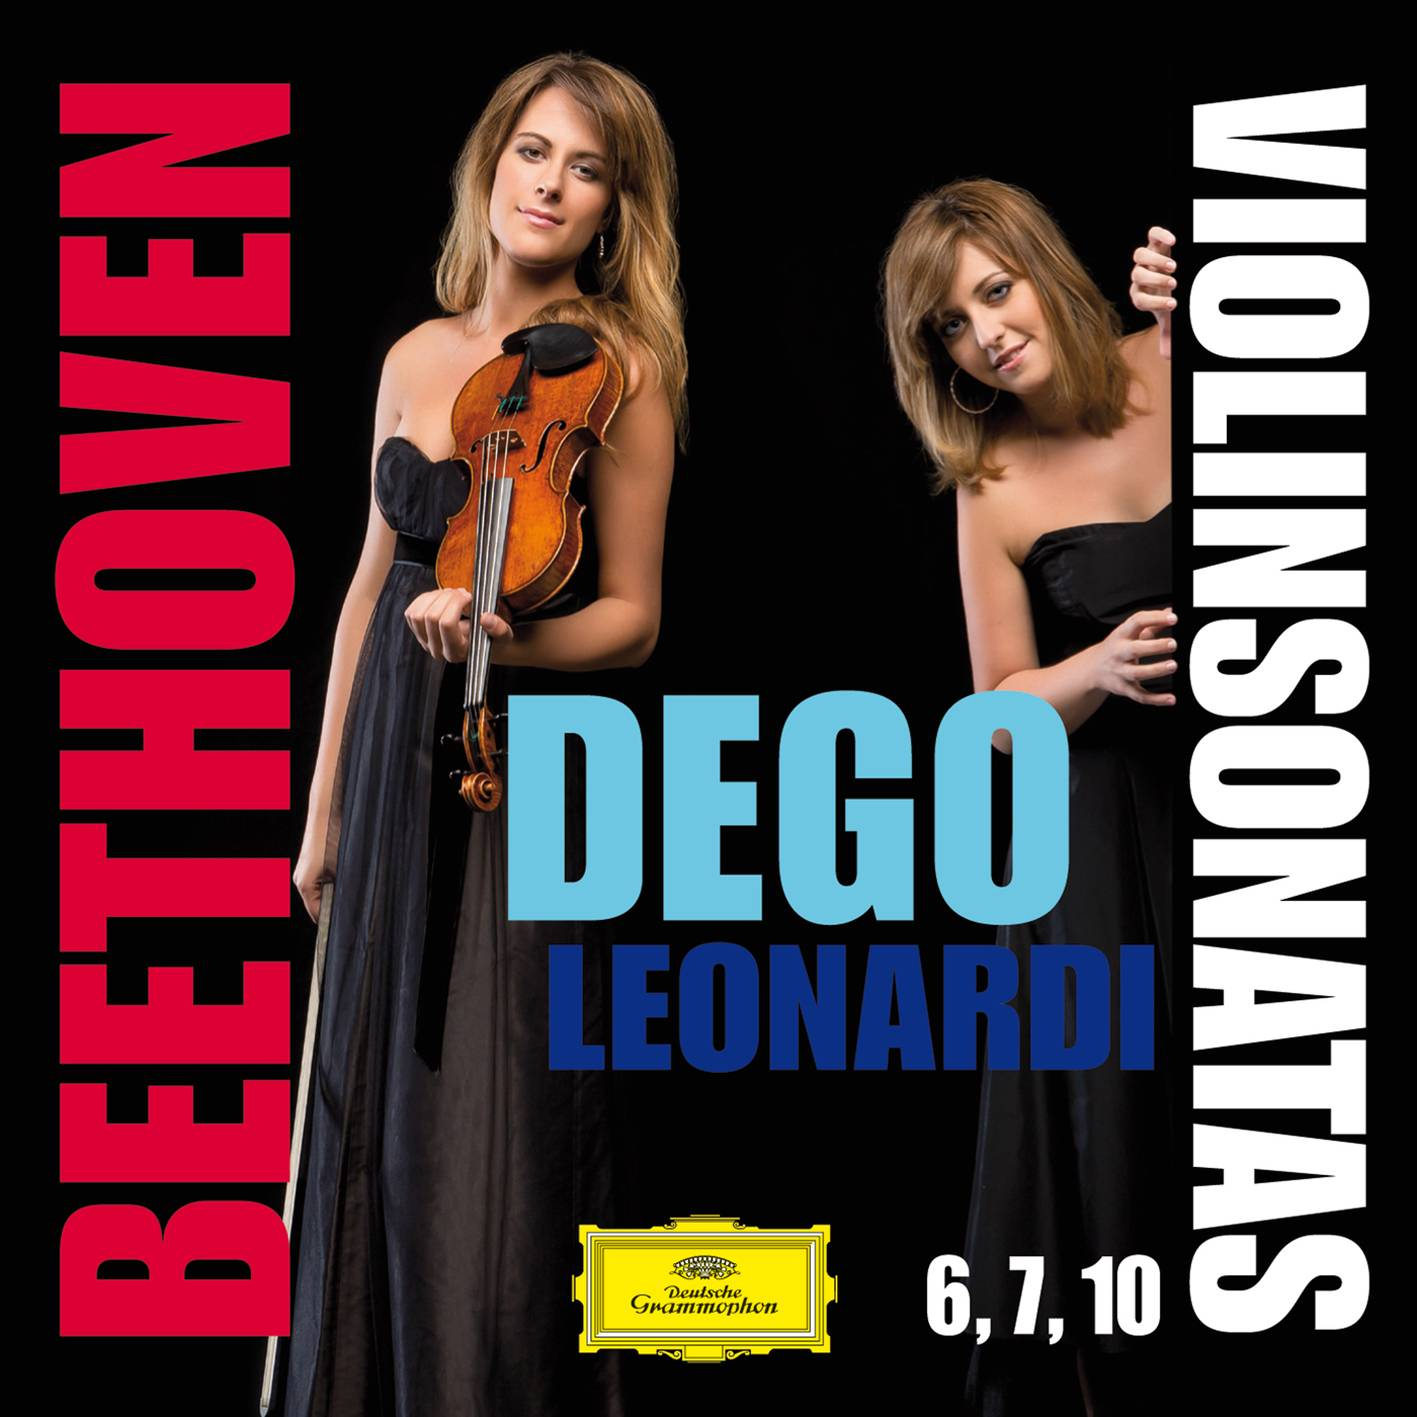 Francesca Dego & Francesca Leonardi - Beethoven: Violin Sonatas Nos. 6, 7 & 10 (2015) [Official Digital Download 24/96]